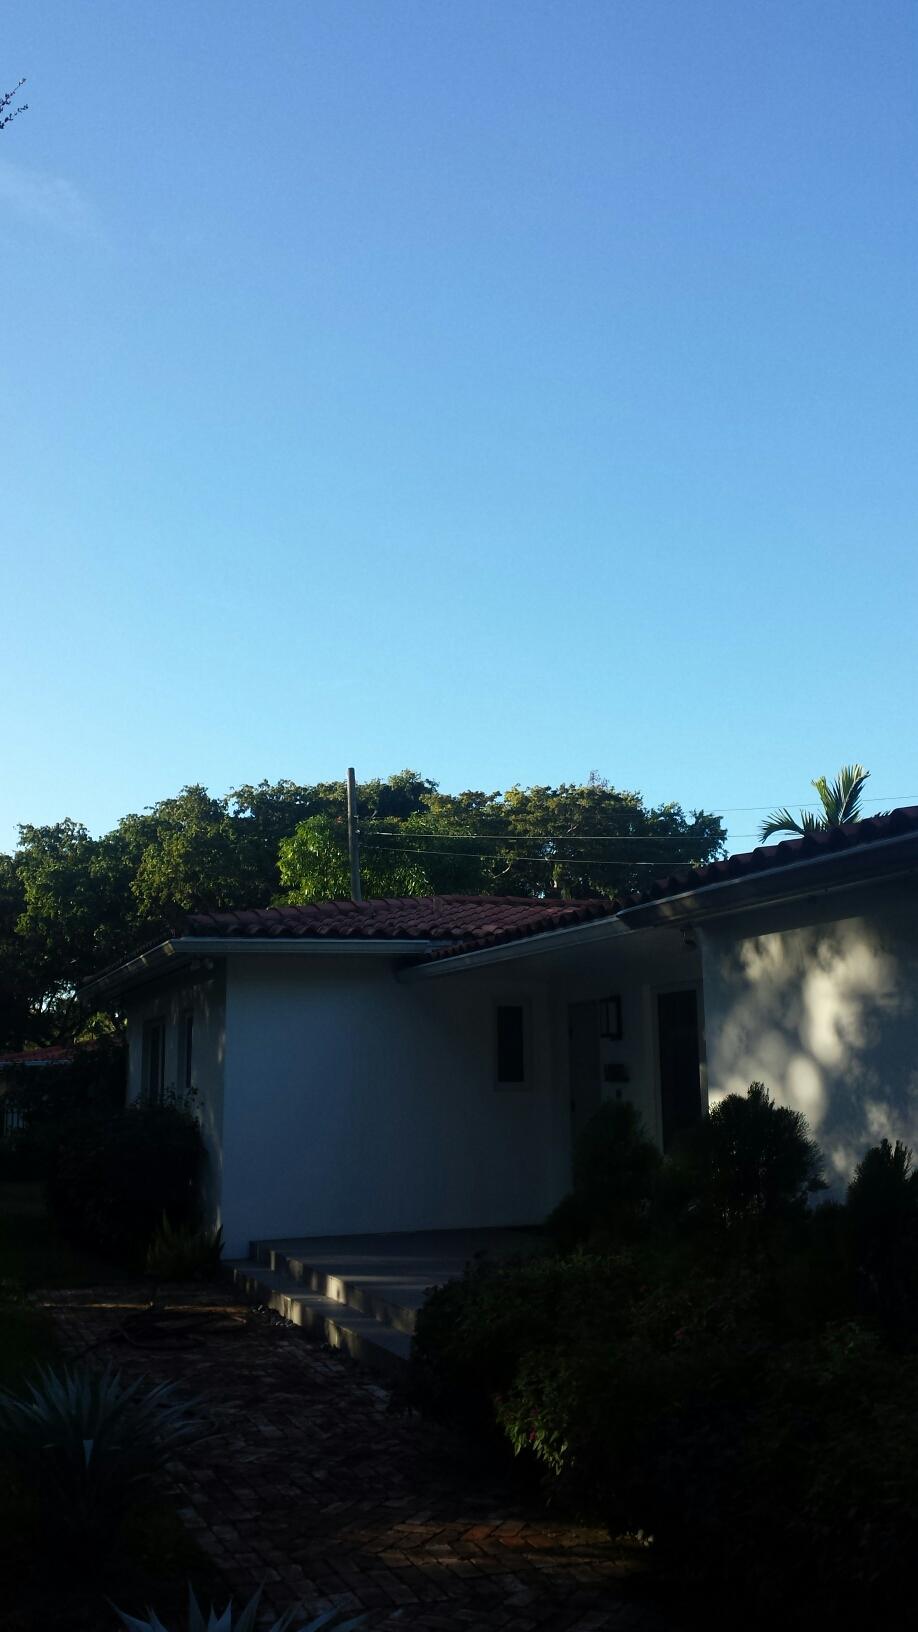 Coral Gables, FL - Tile roof repair estimate at Coral Gables